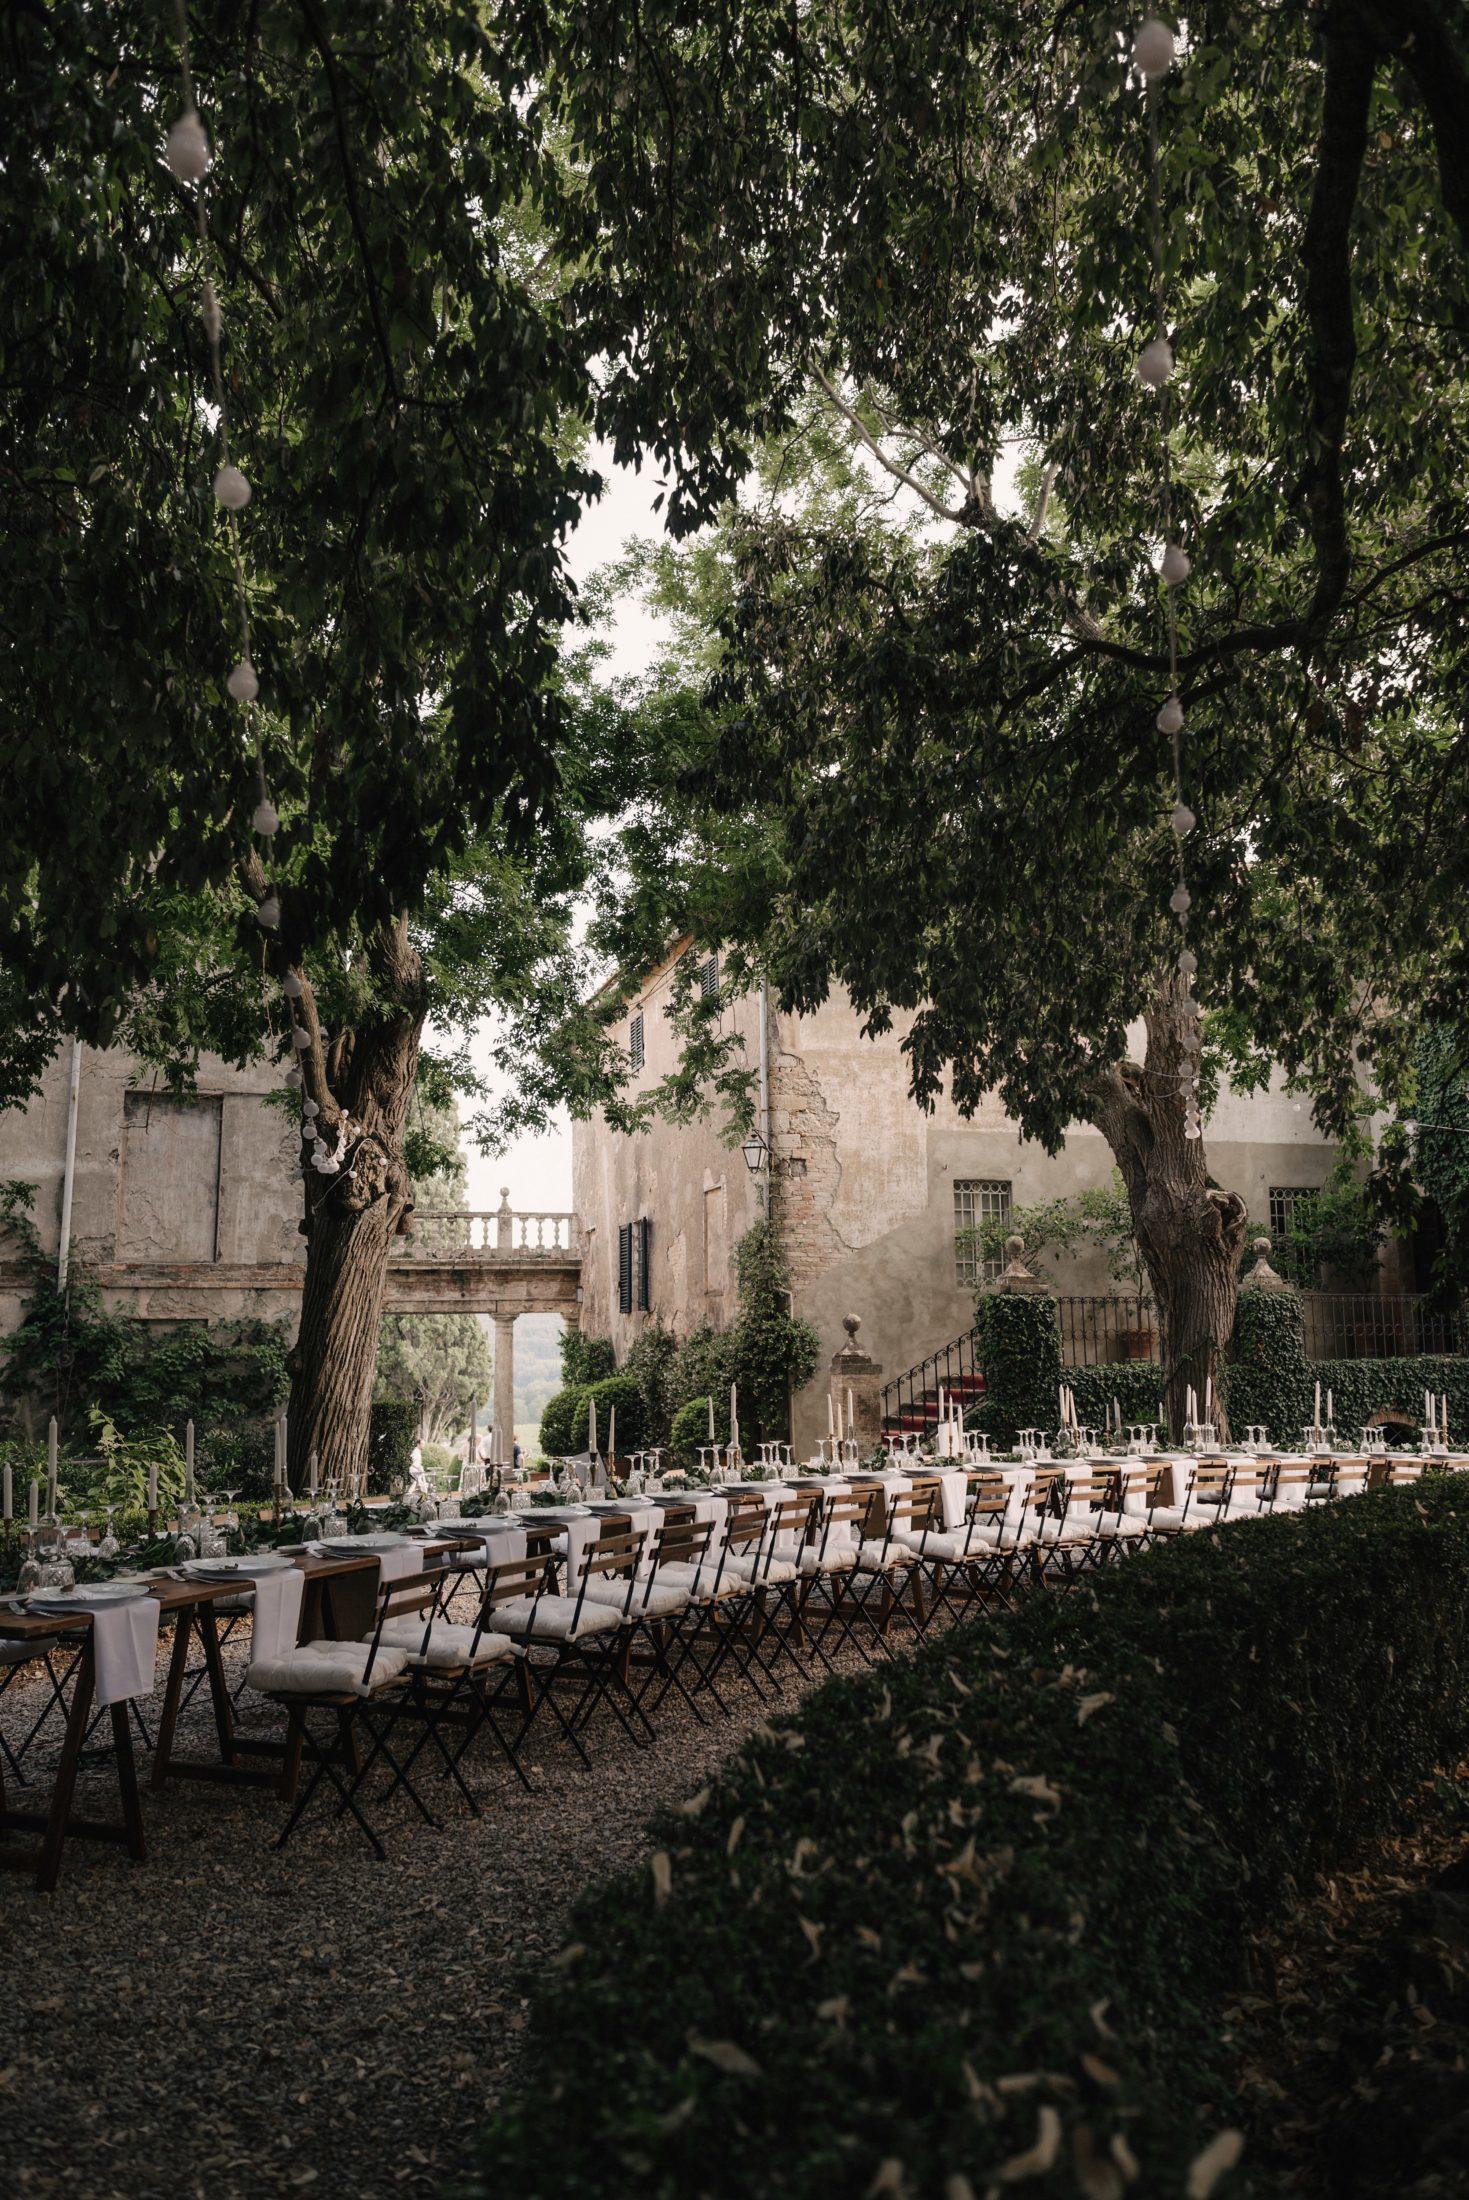 TUSCANY WEDDING-22695-macarenagea